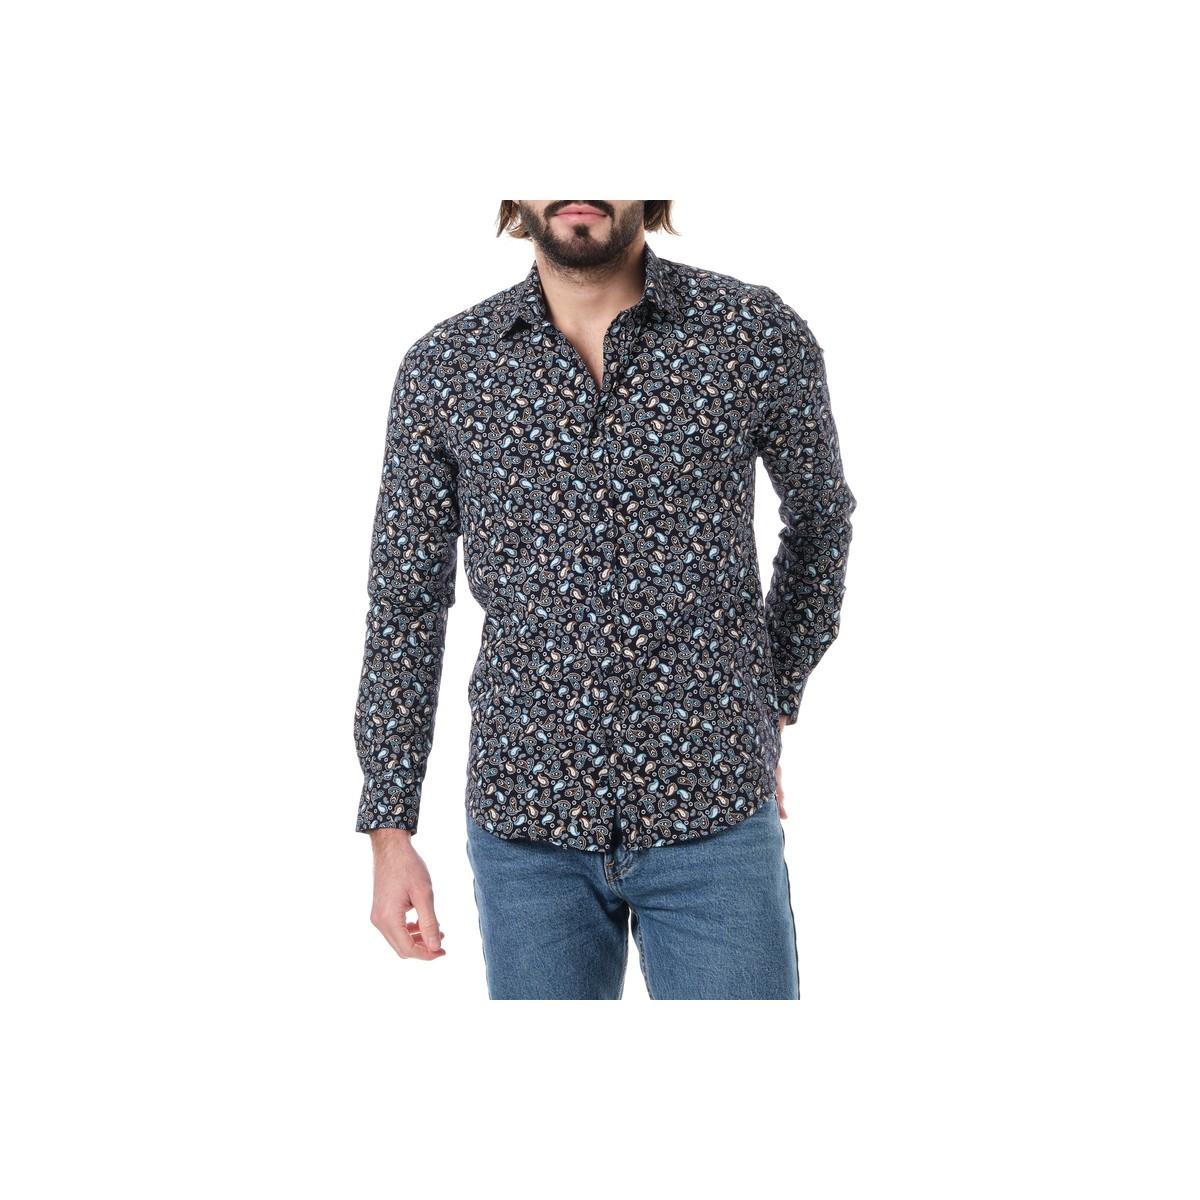 T-shirt Sagat